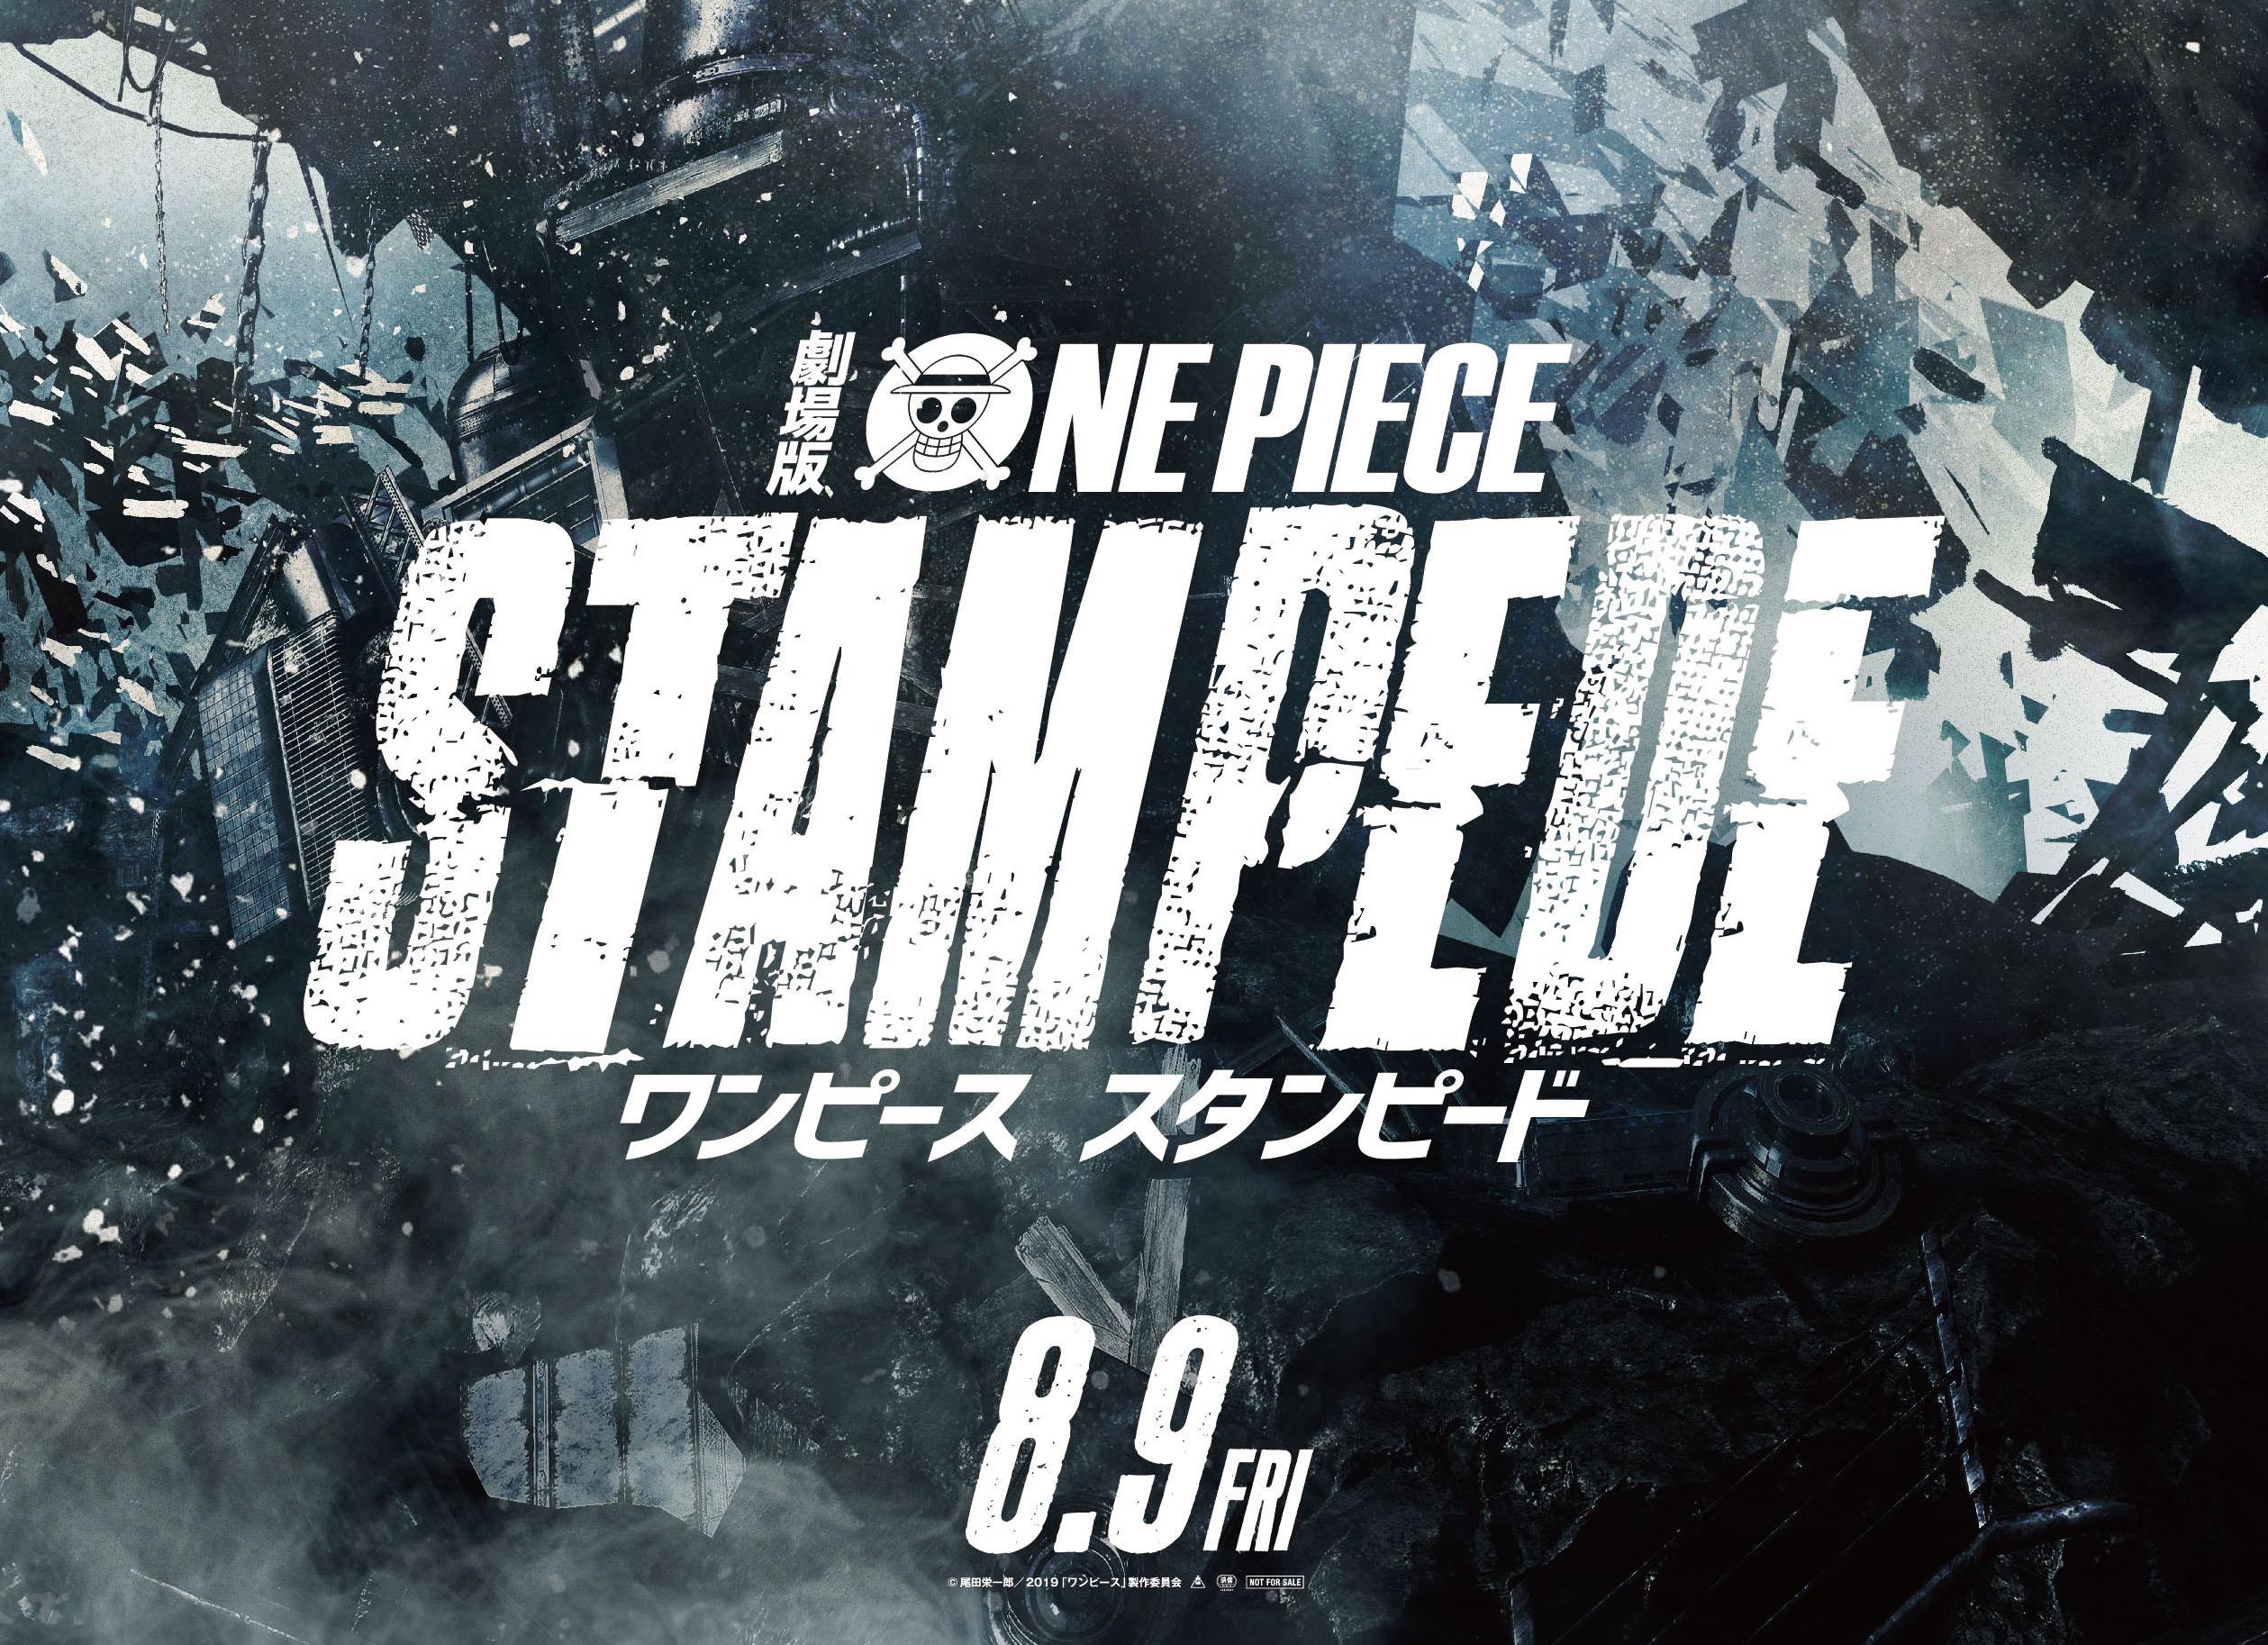 One piece Stampede movie HD Wallpaper Background Image 2518x1826